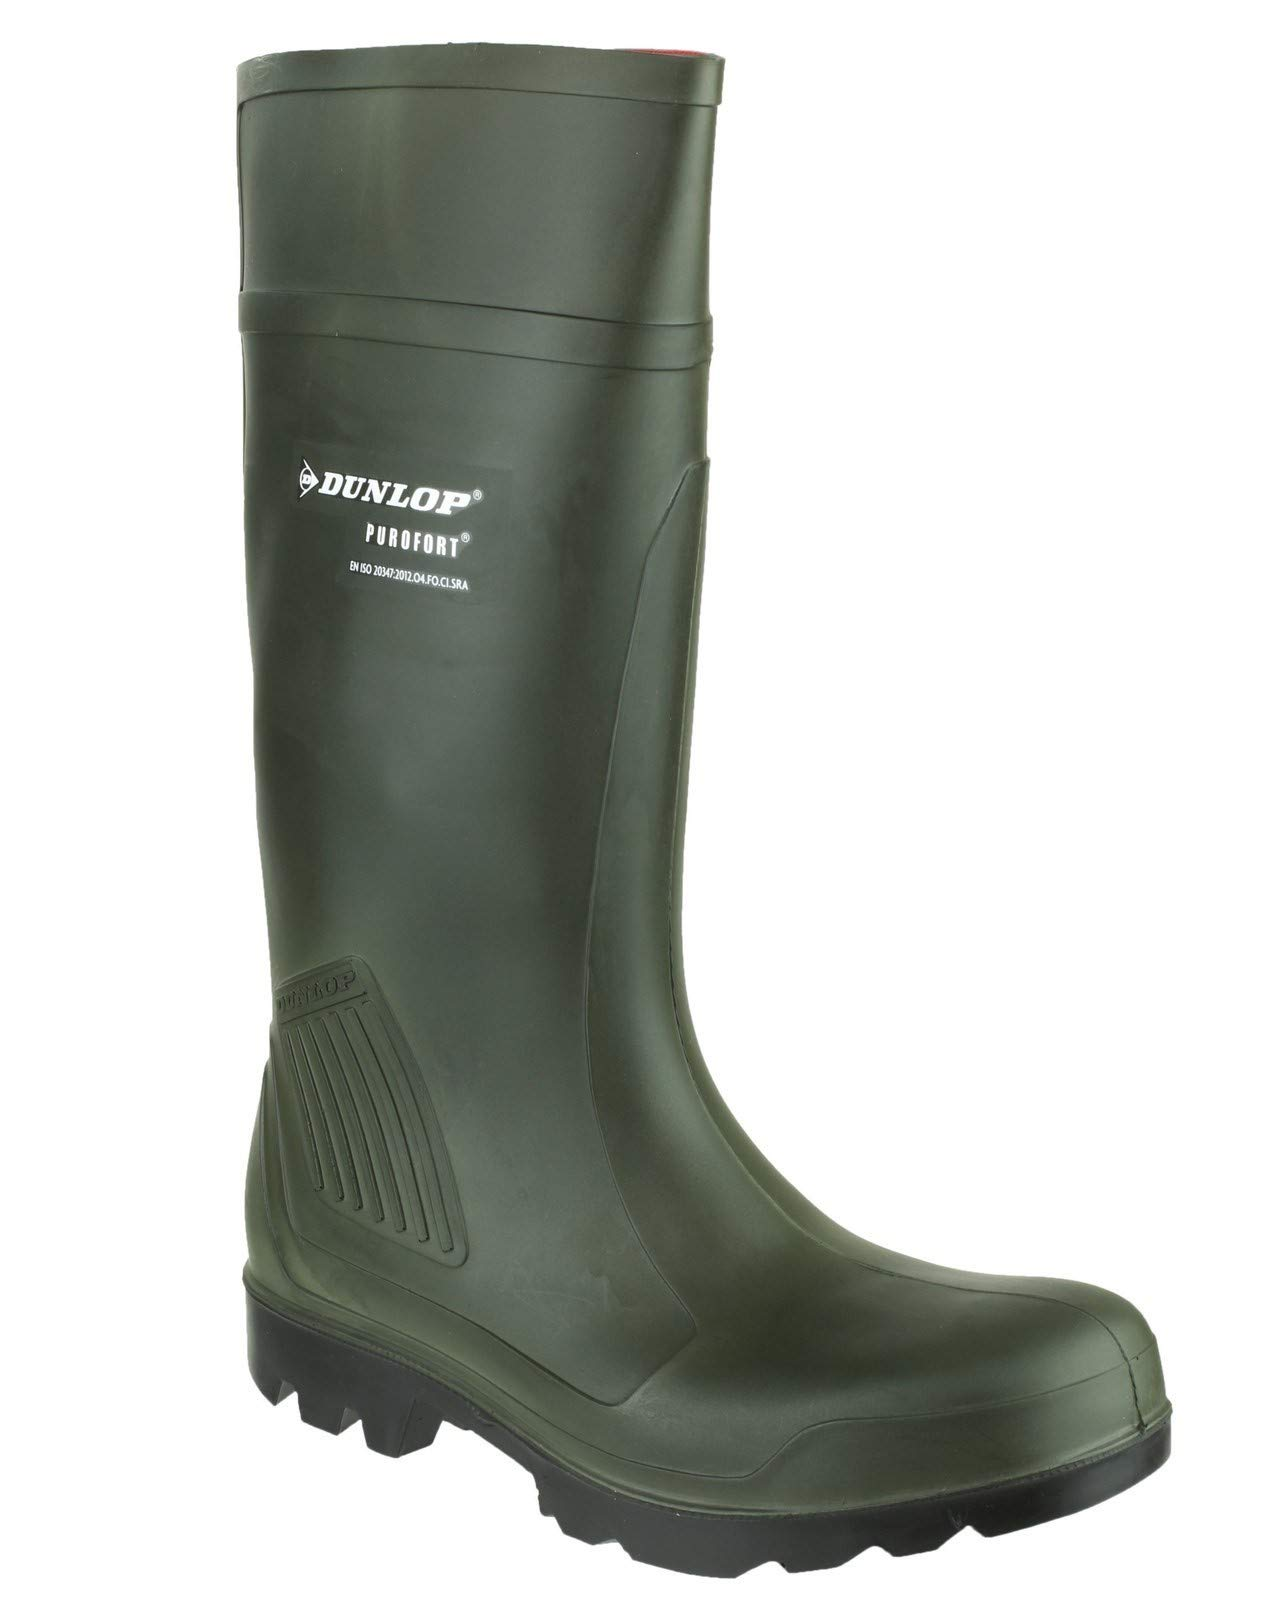 Dunlop Purofort Professional Dark Green/Black, Without Steel Toe D460933 Size - 11 by Dunlop